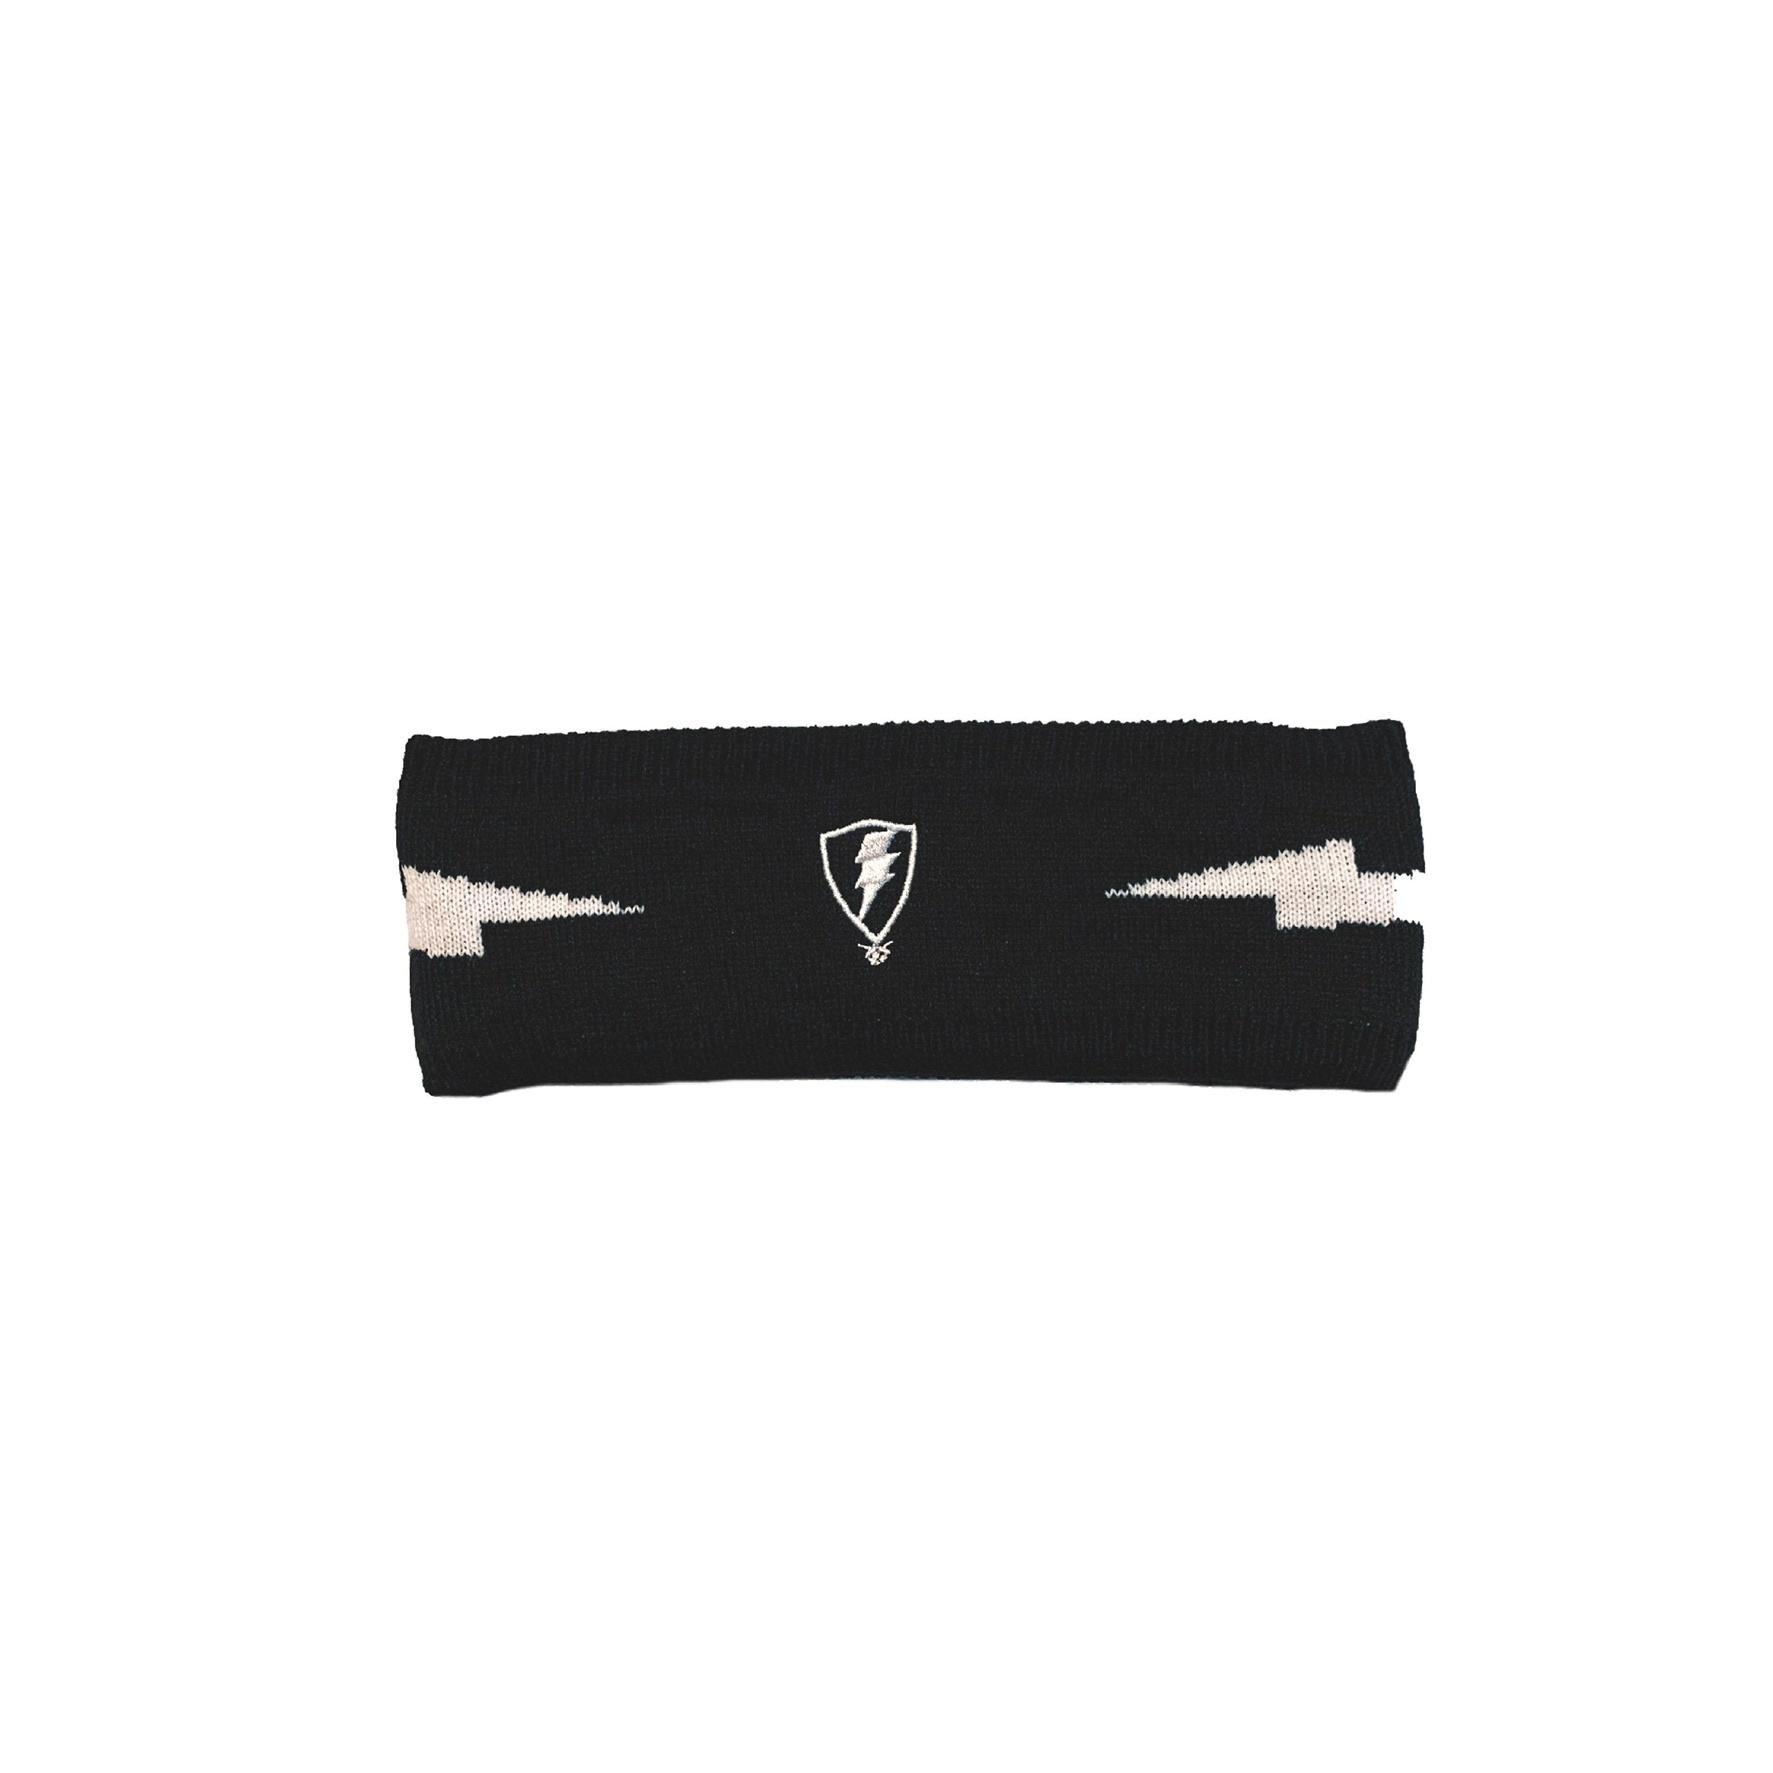 jugrnaut-jugrnaut-asw-panthro-headband-white-bolt